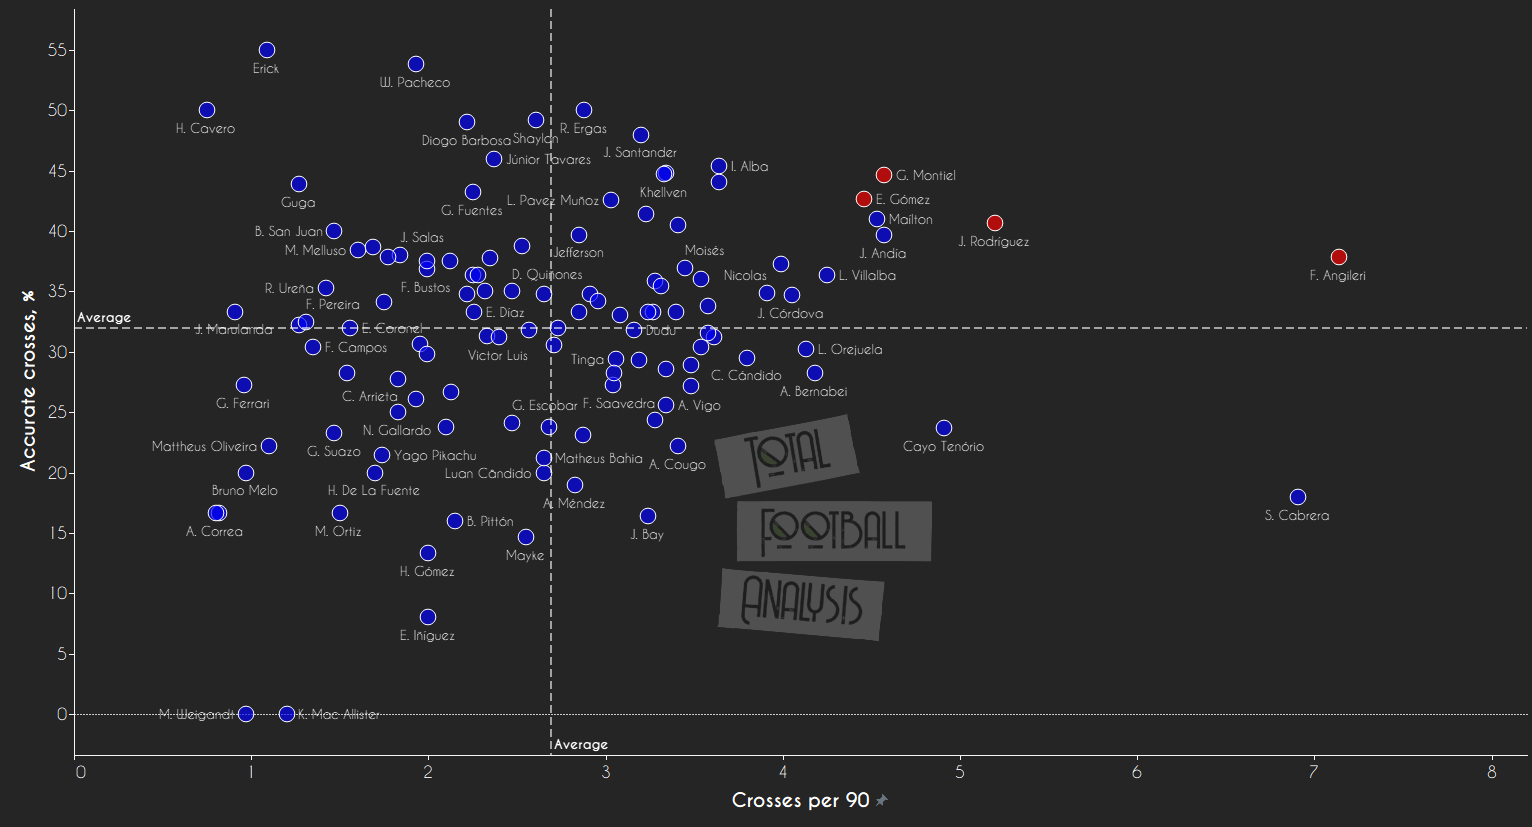 Data Analysis: South American full-backs ready for European football